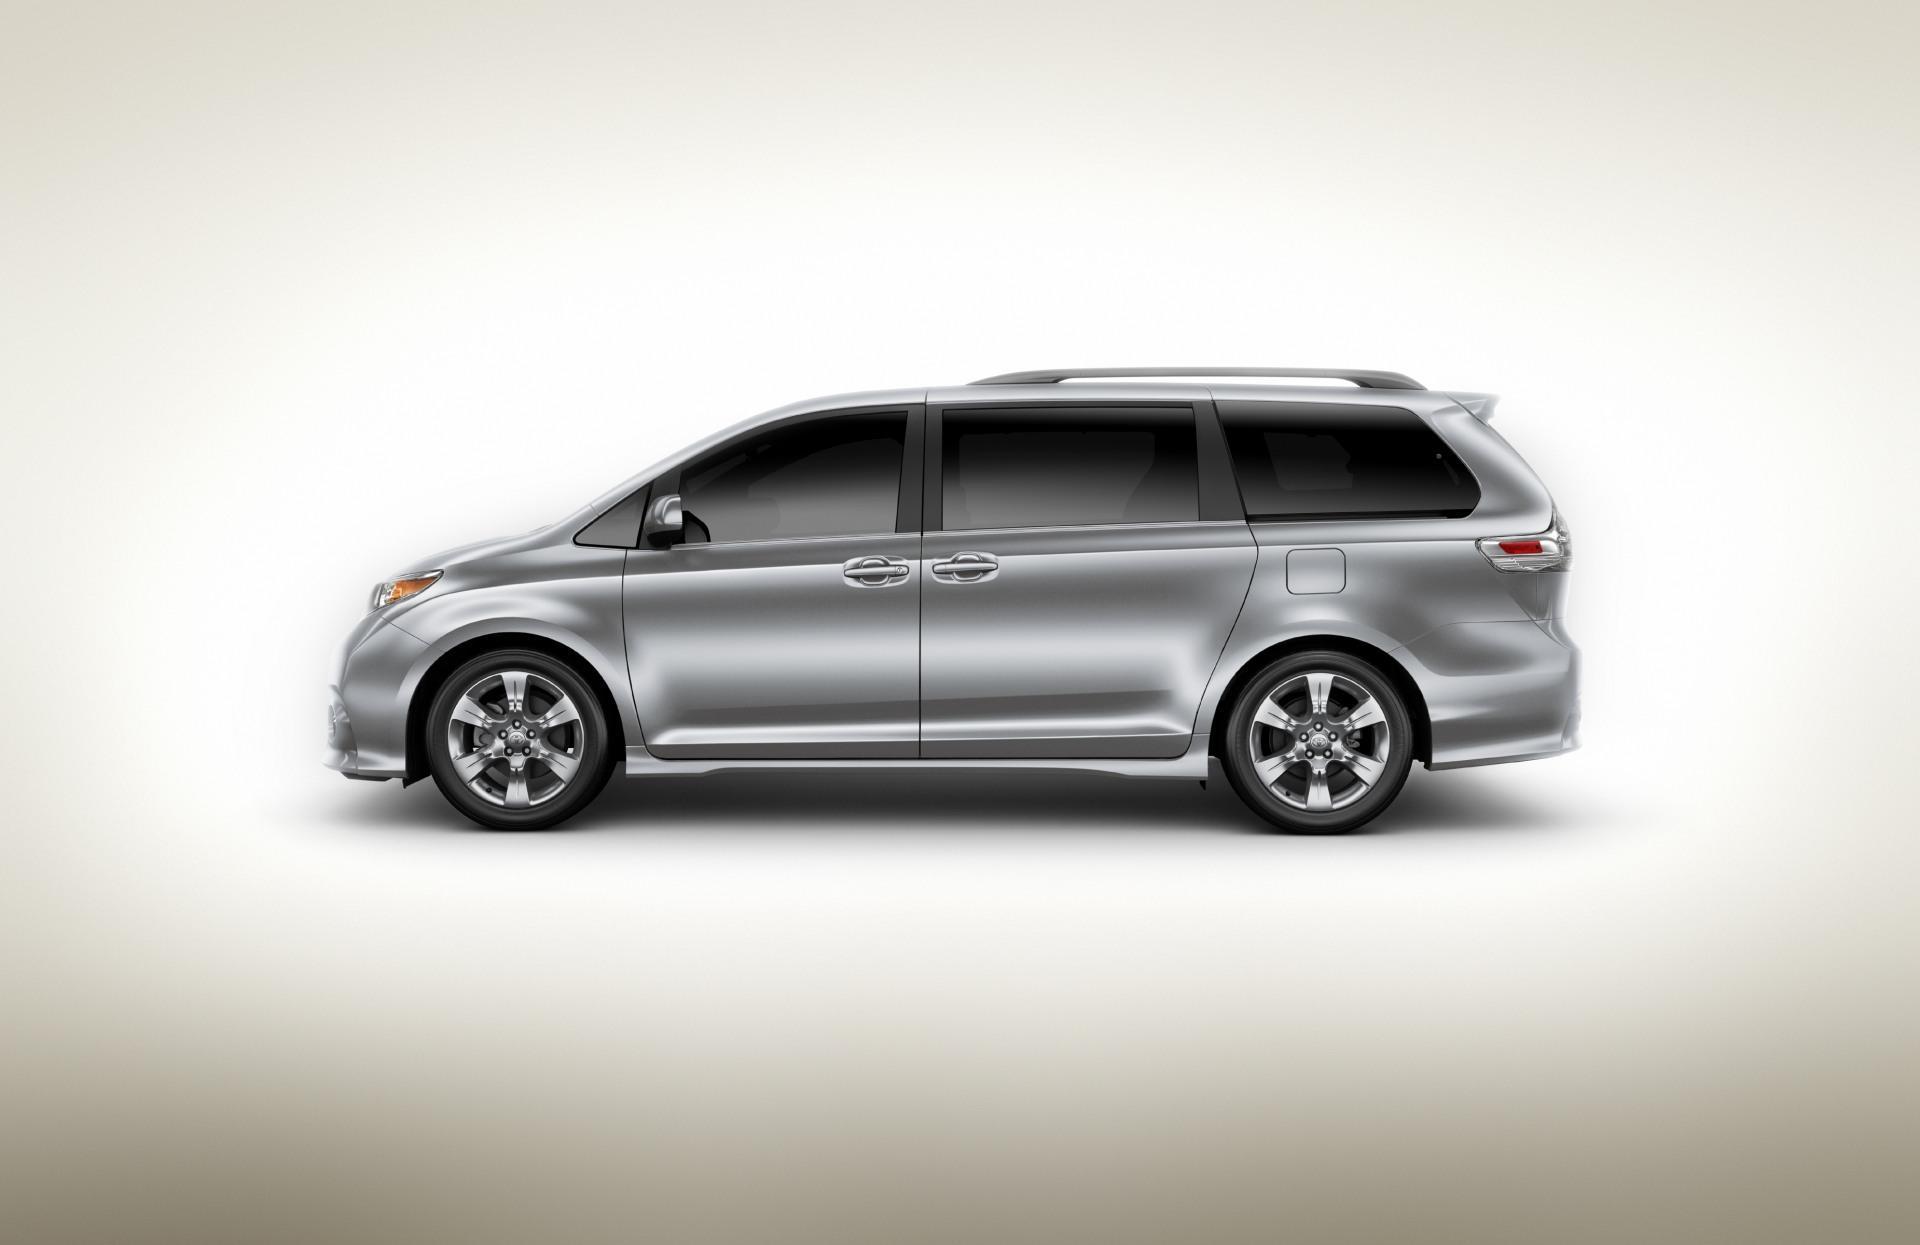 2011 Toyota Sienna News and Information | conceptcarz.com